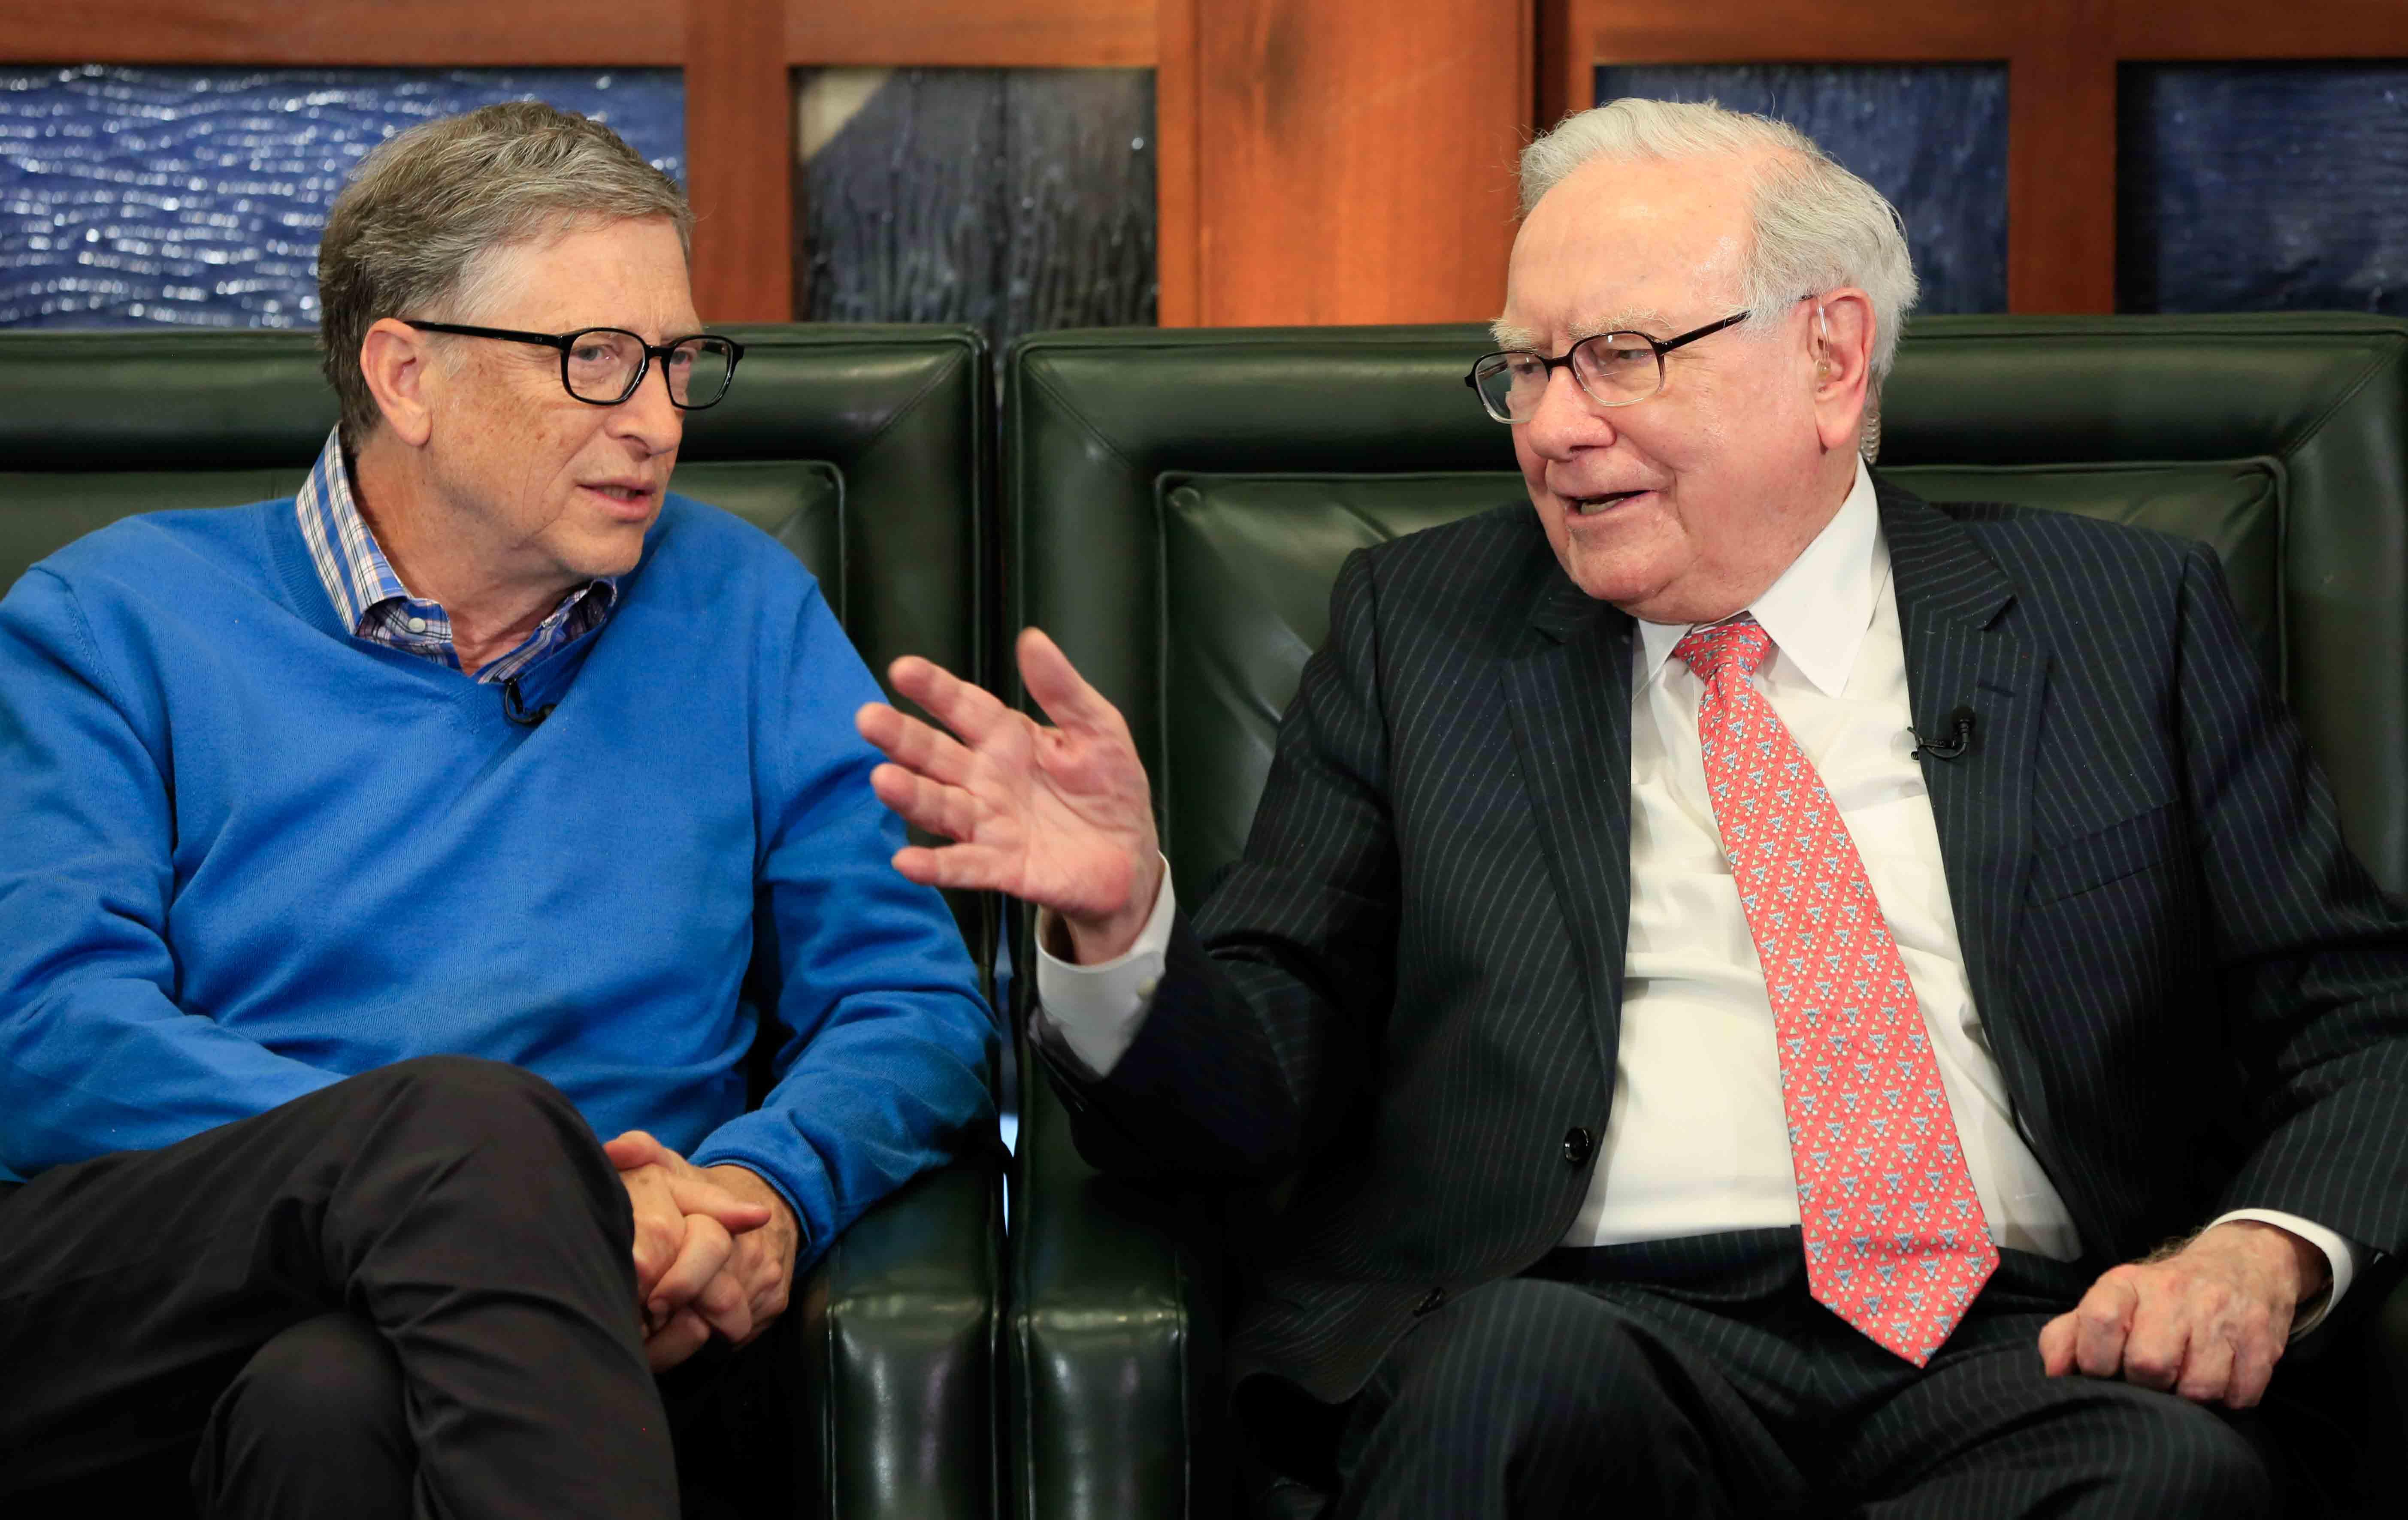 Bill Gates Jeff Bezos And Warren Buffett Own More Wealth Than The